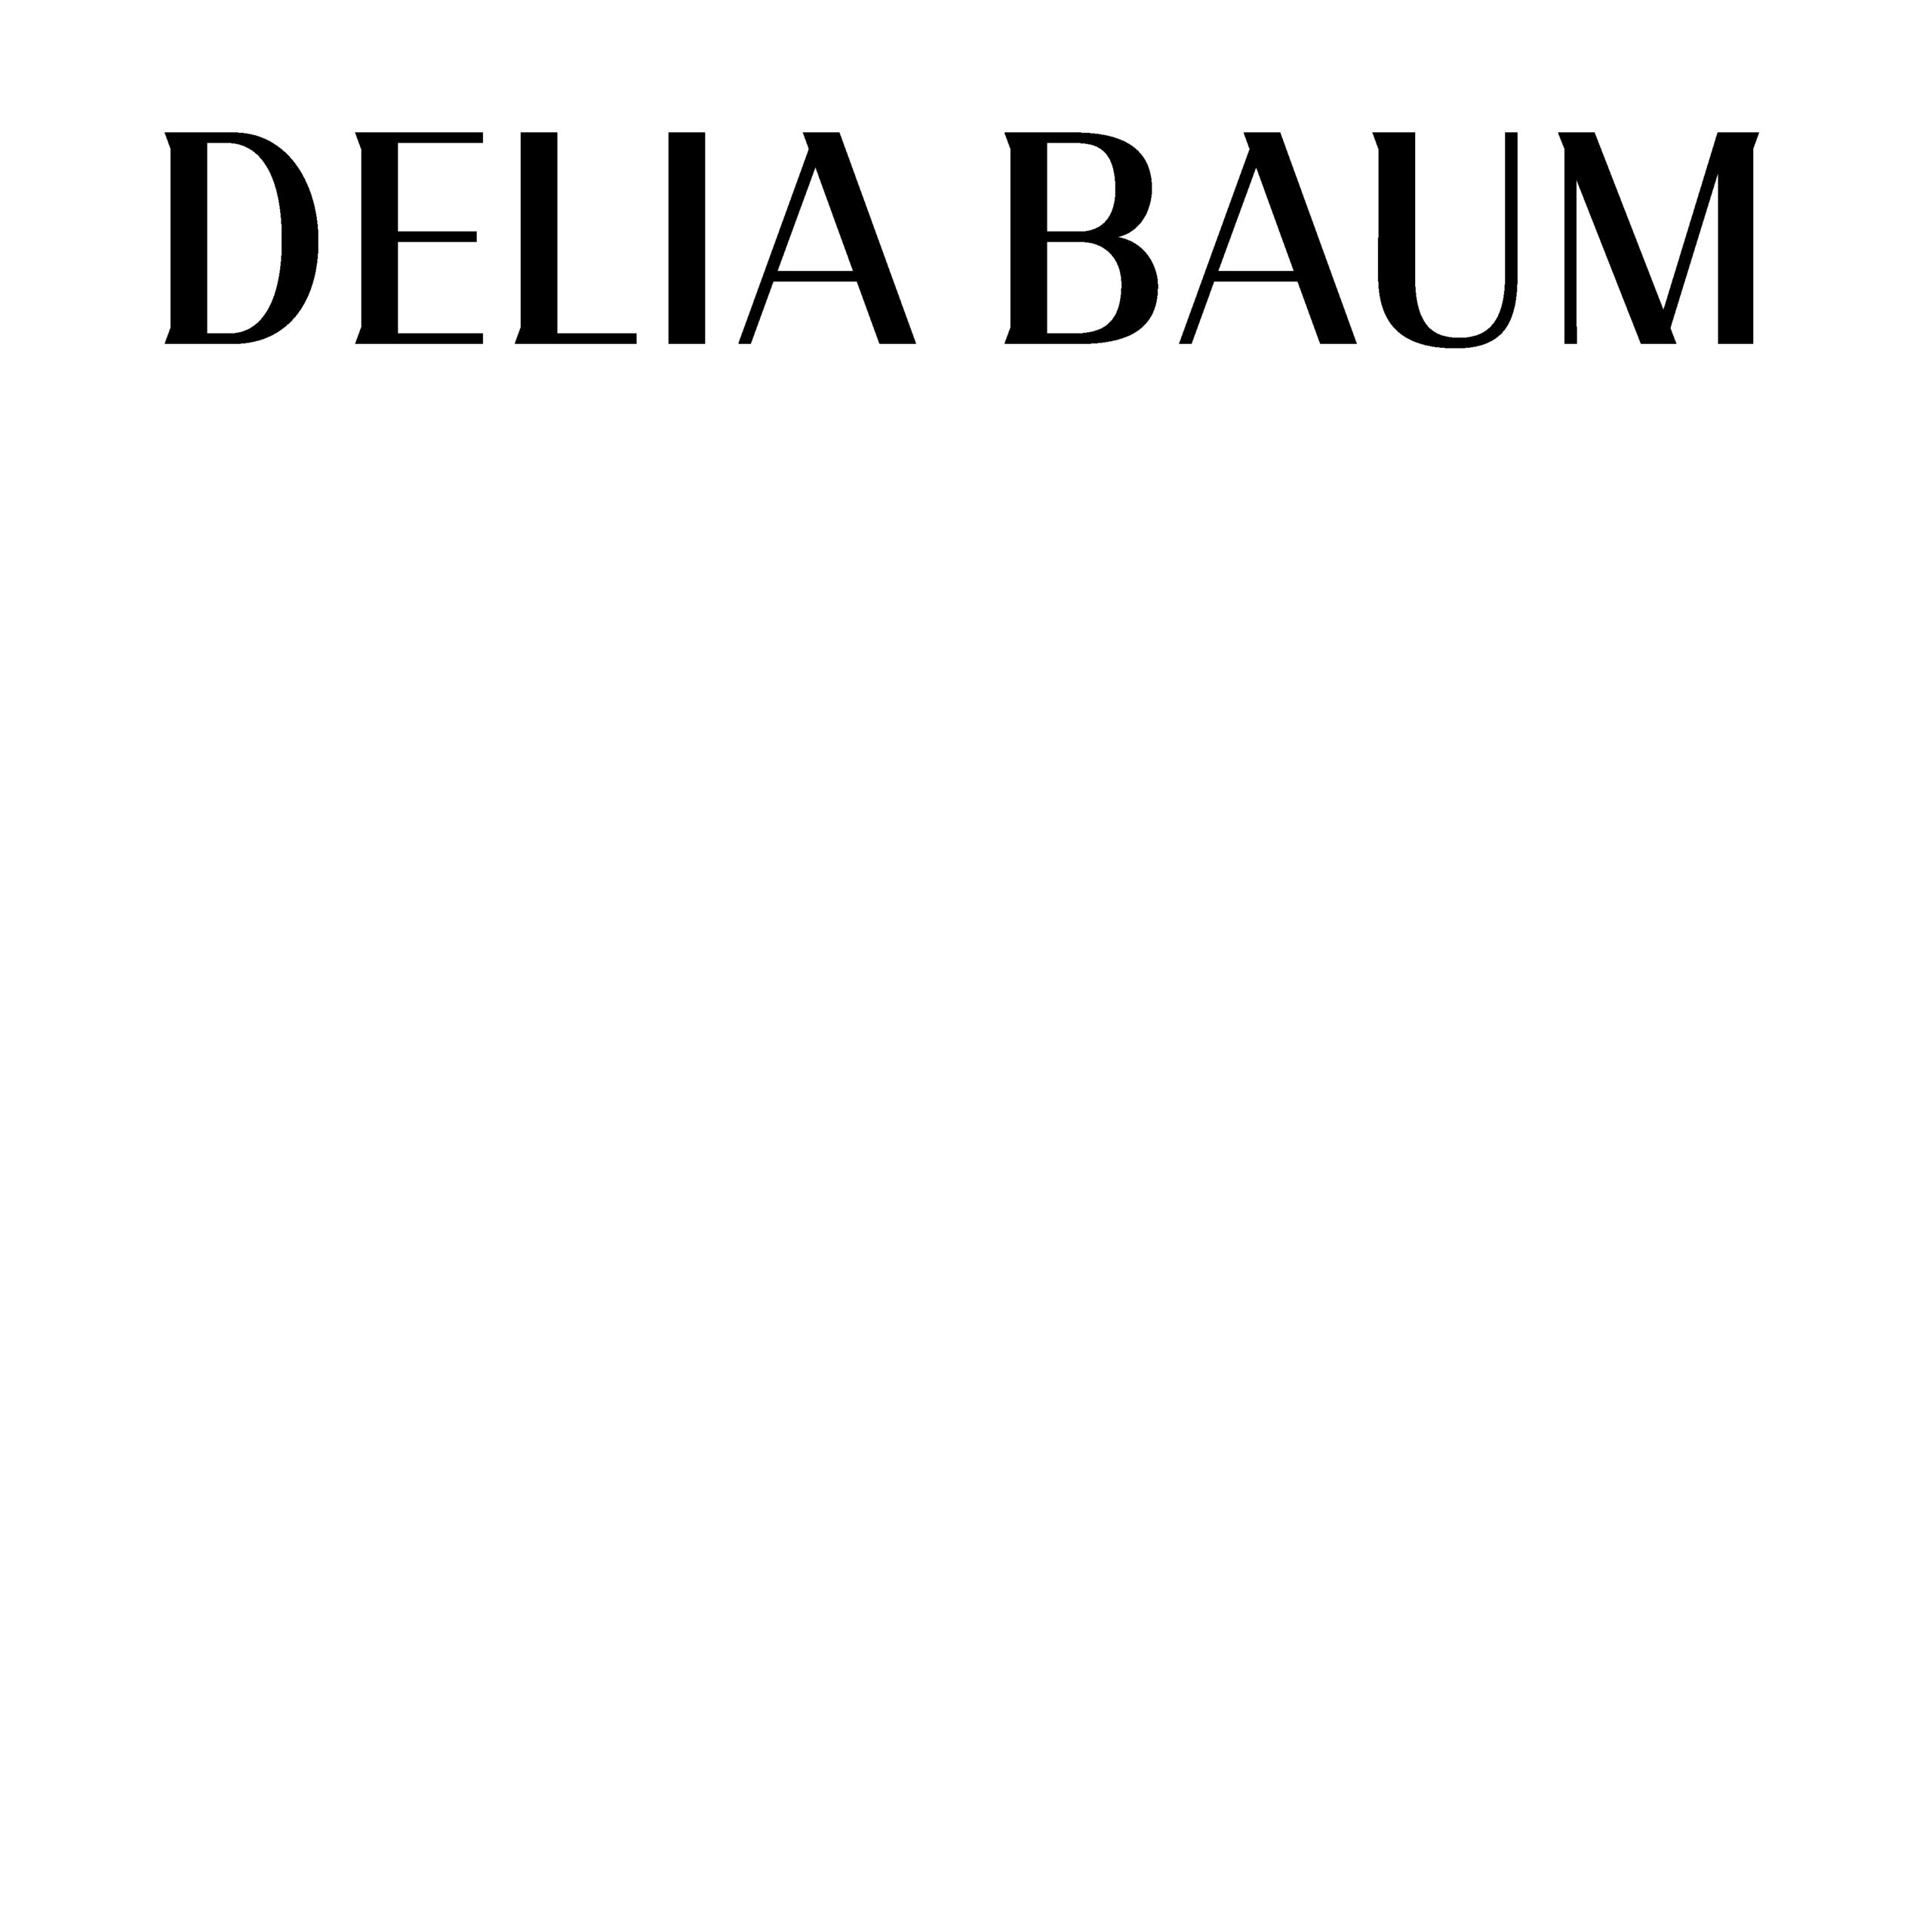 01_Delia-Baum_CI_Daniel-Stuhlpfarrer_Tite-1